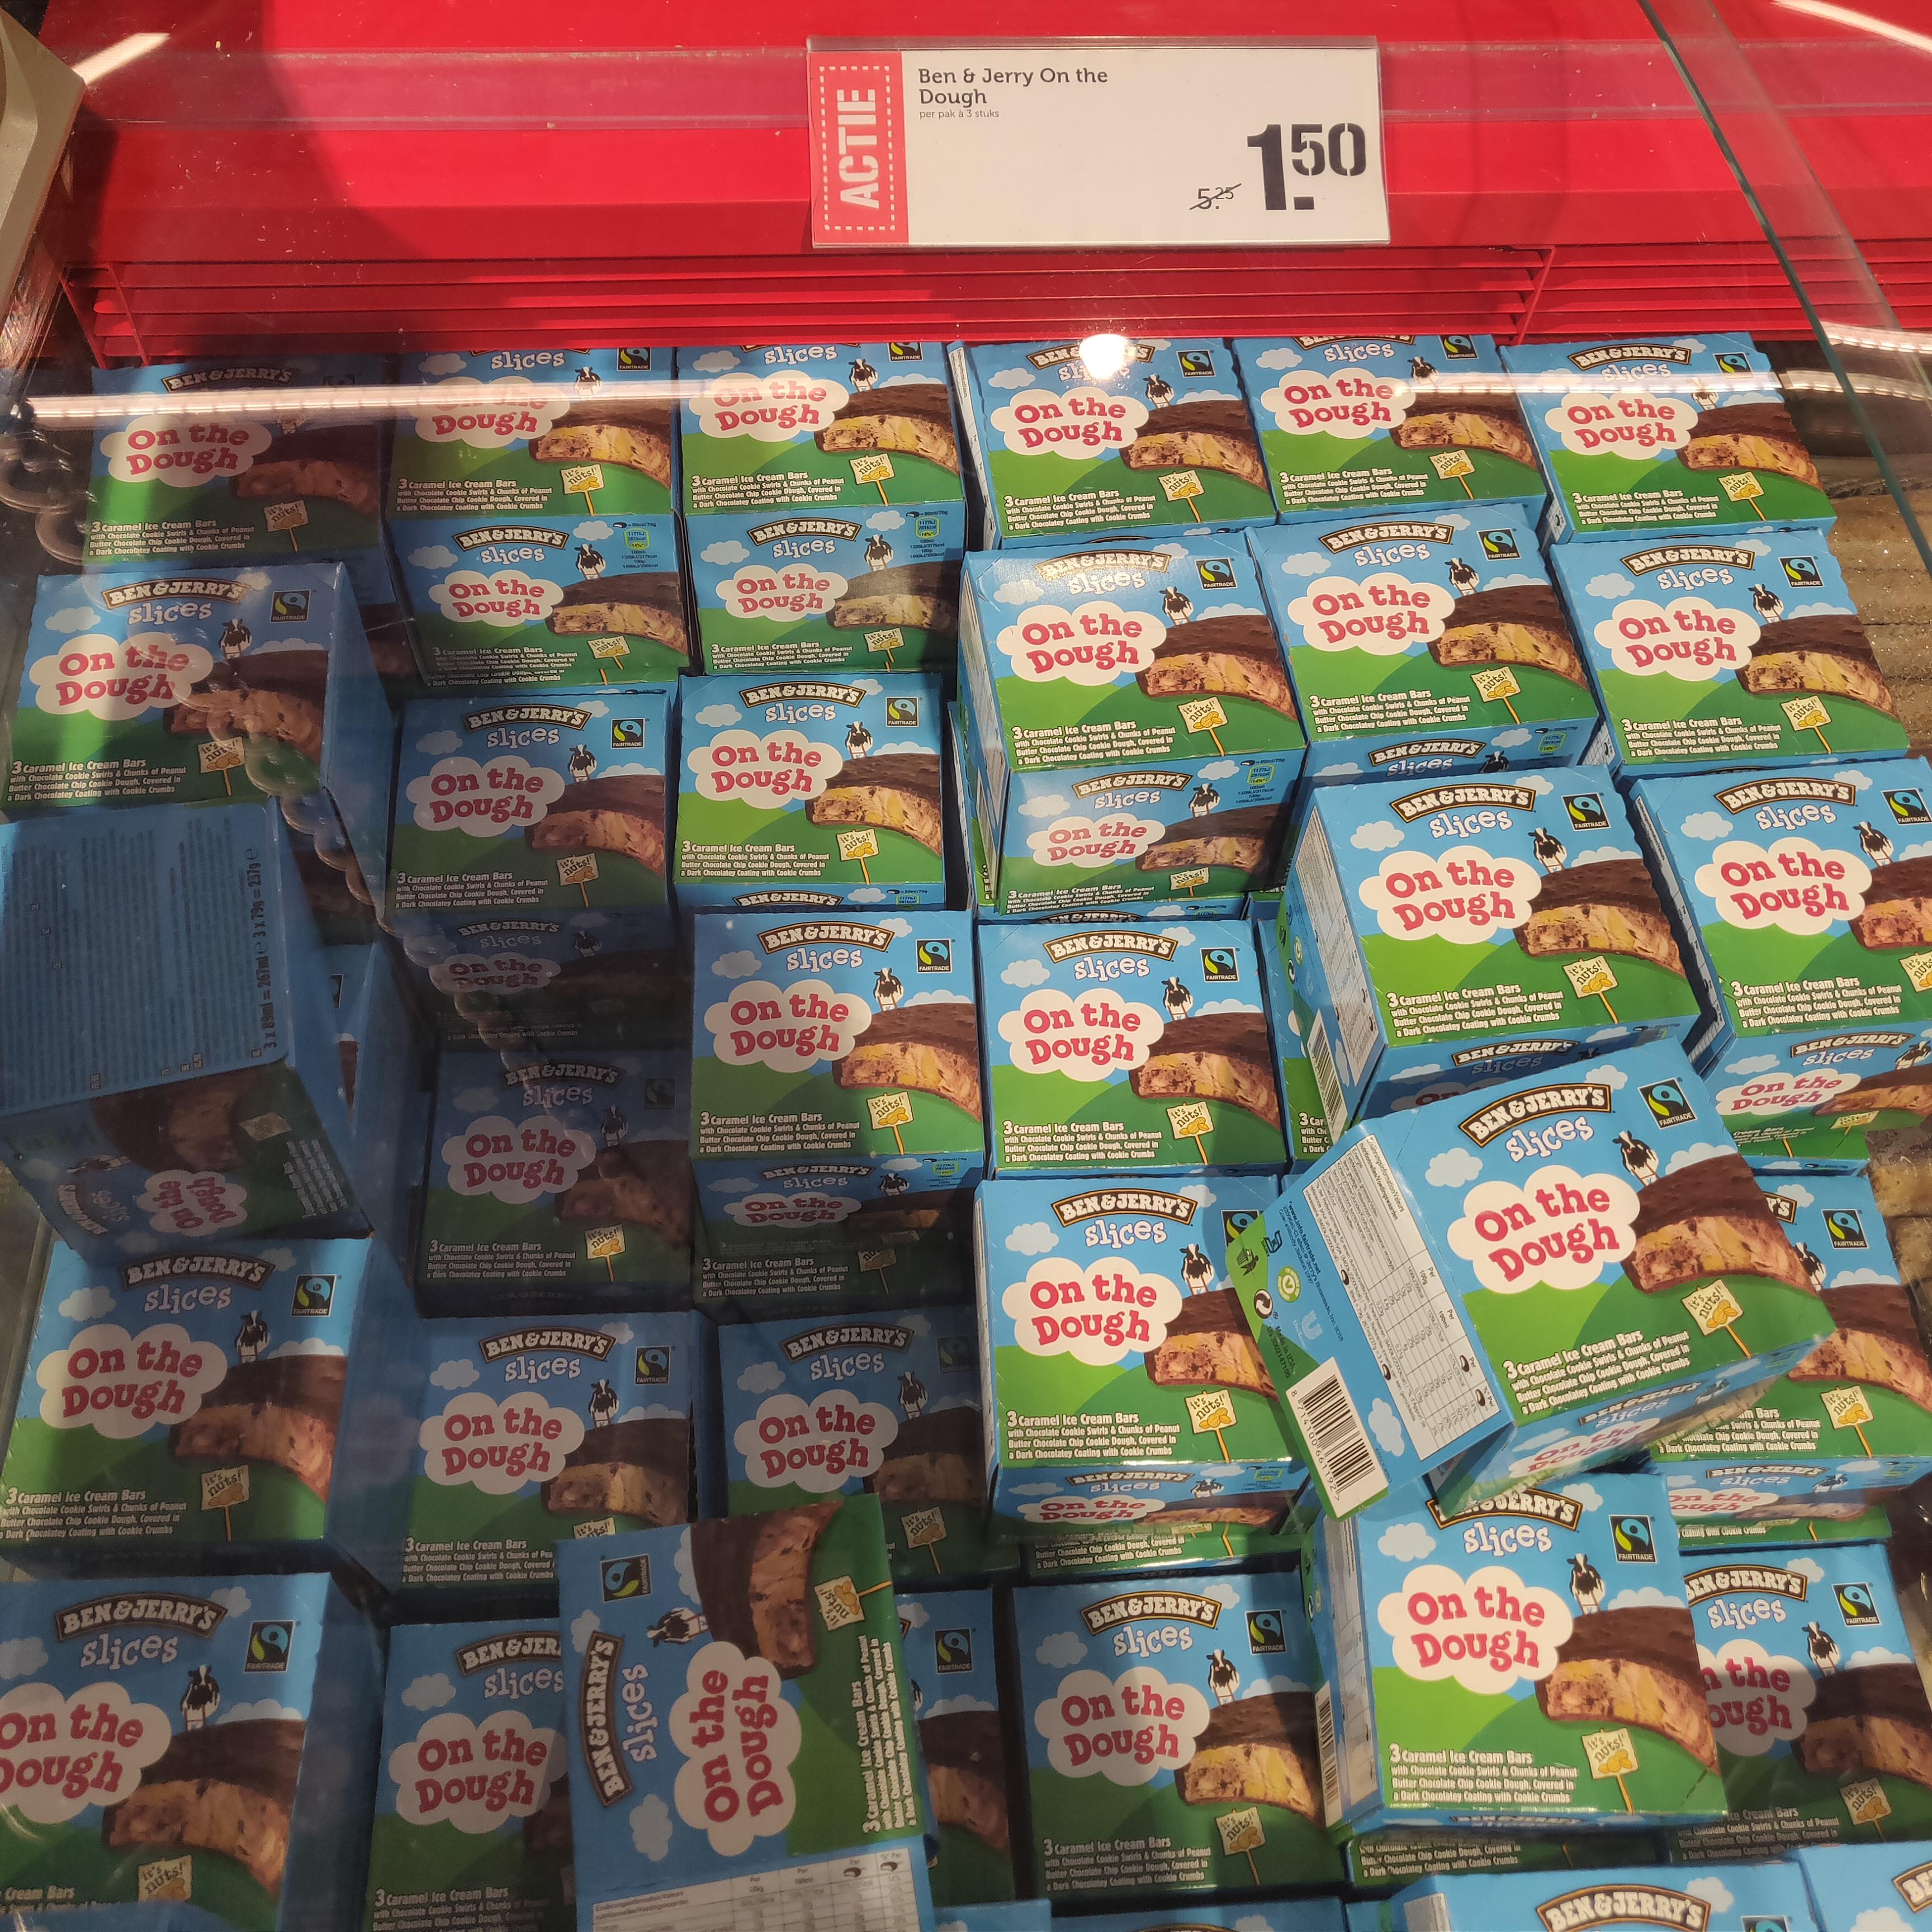 [Den Bosch] Ben & Jerry's Slices On the dough @Super Coop